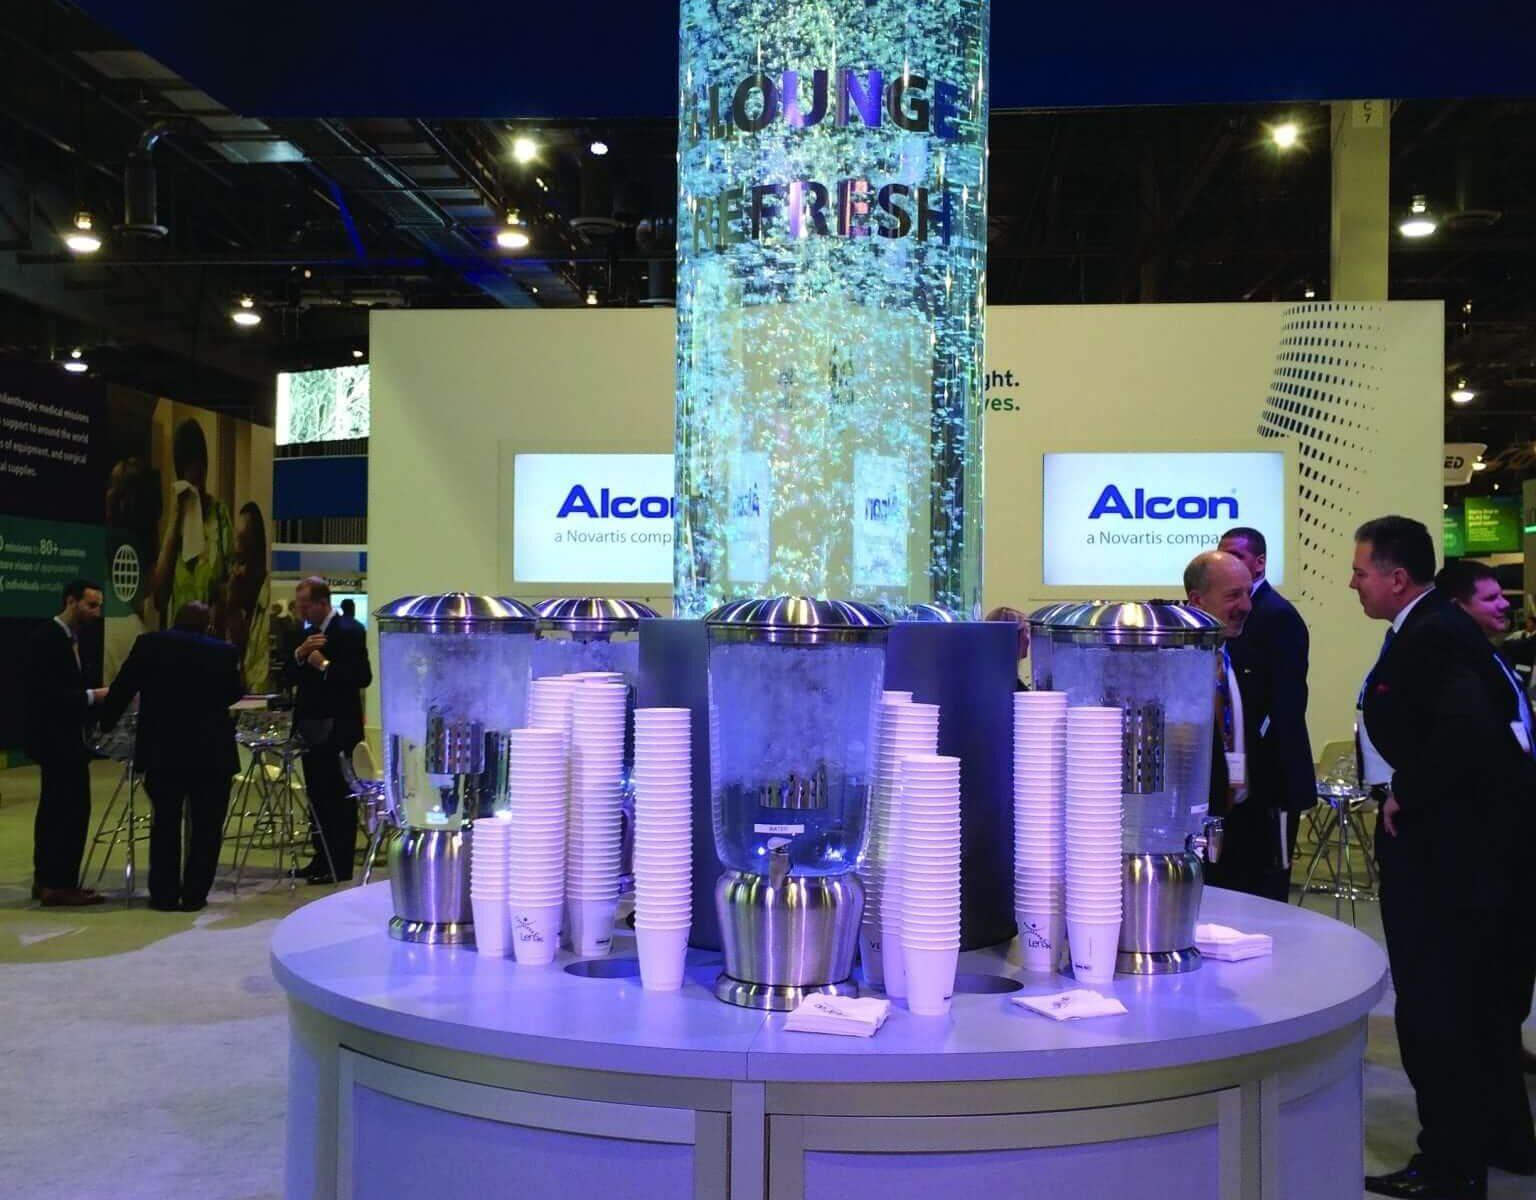 Alcon Tradeshow Exhibit 1